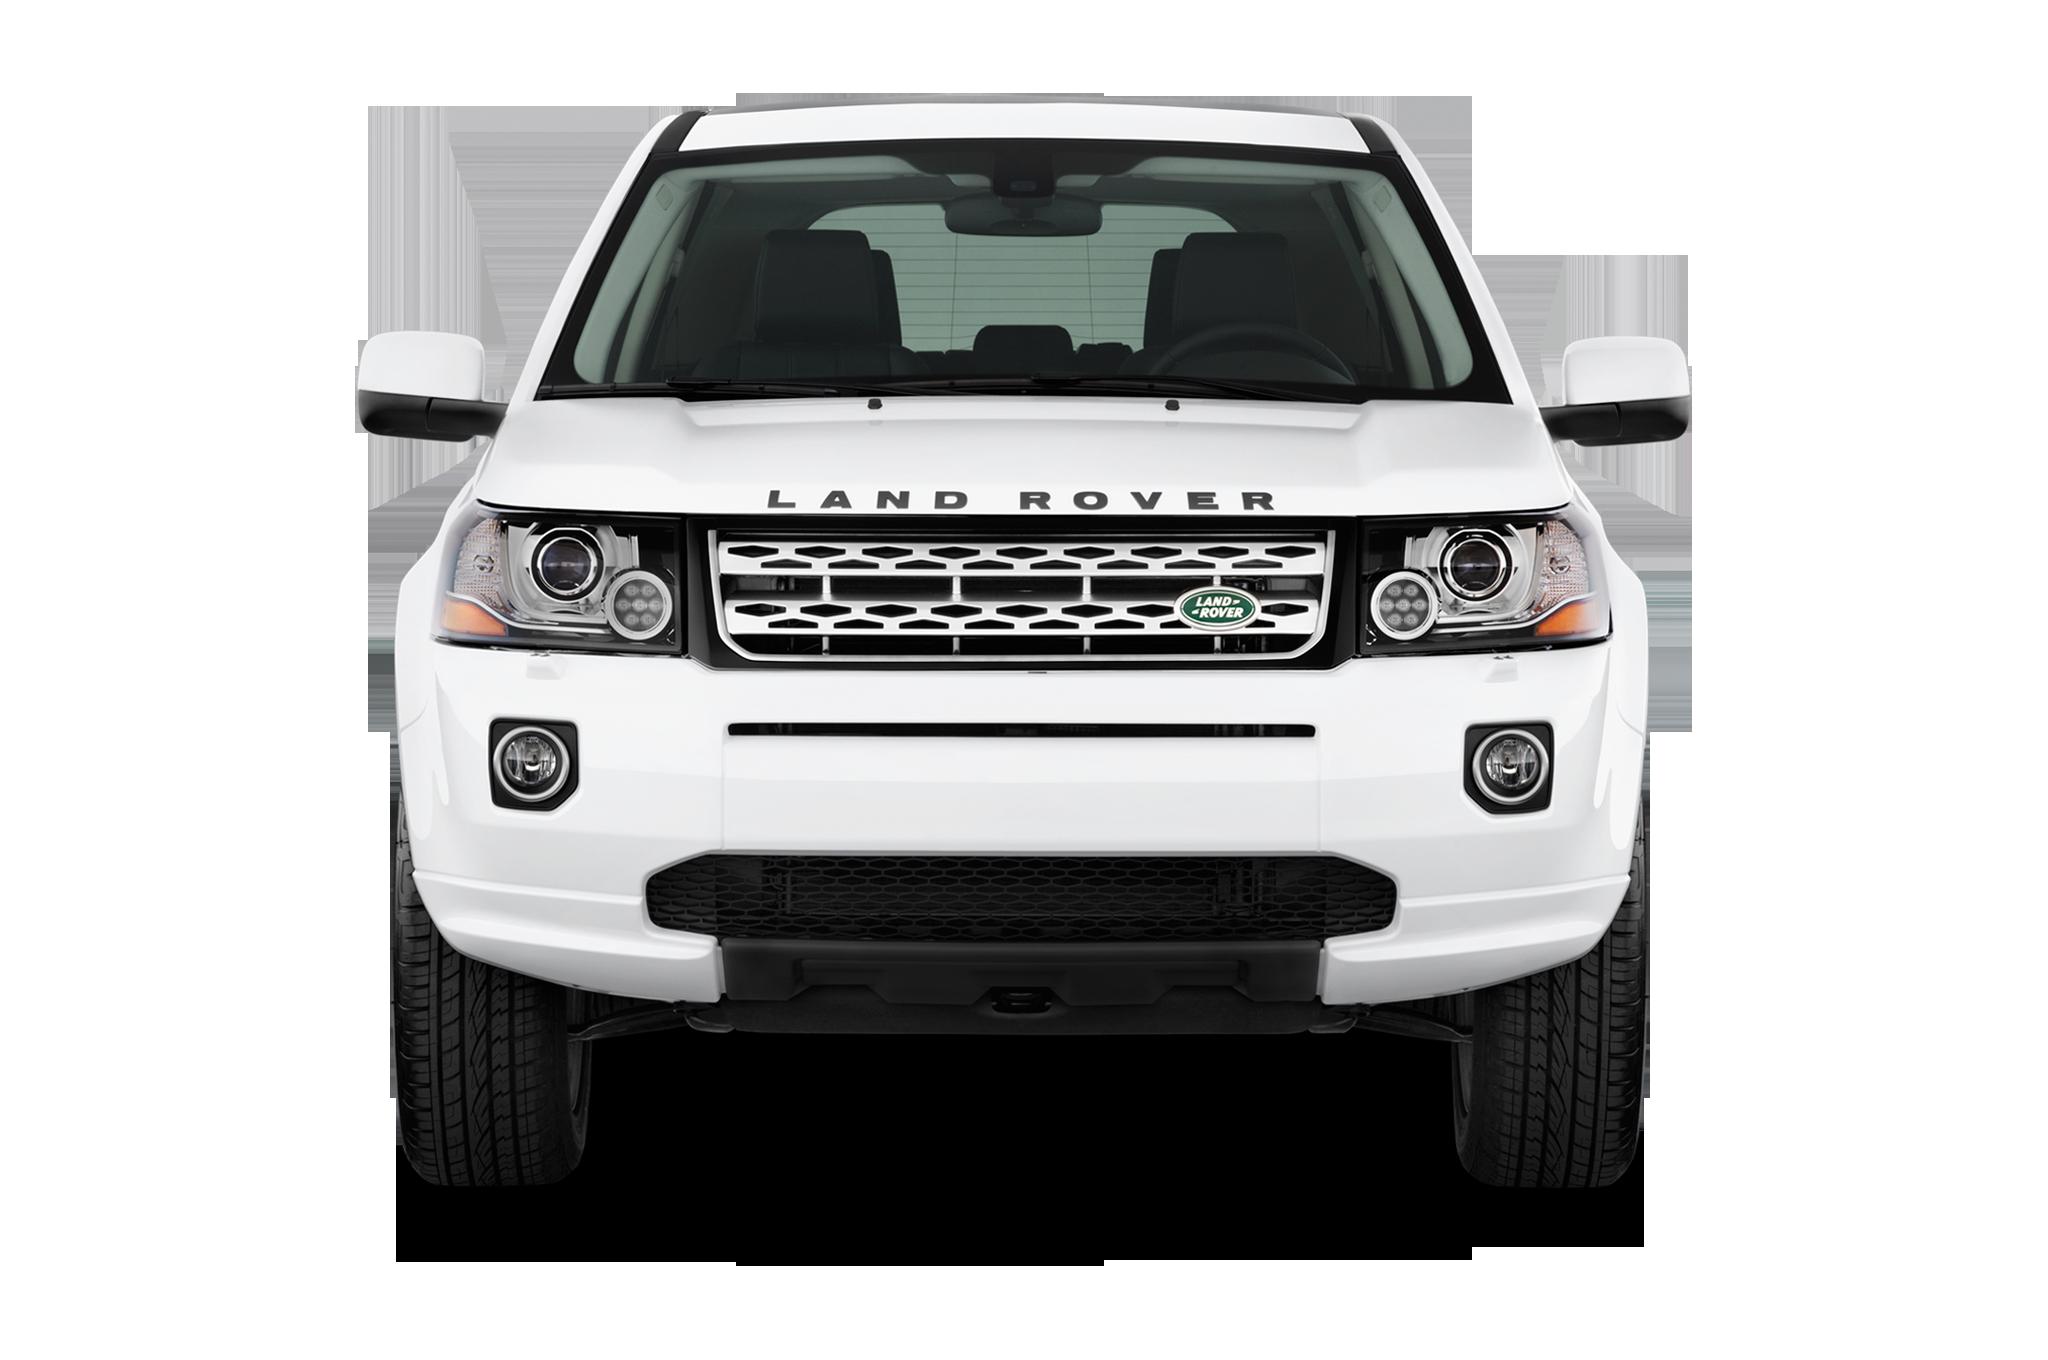 rover manufacturer wheelbase landrover autoguide long price lwb range autobiography review com land